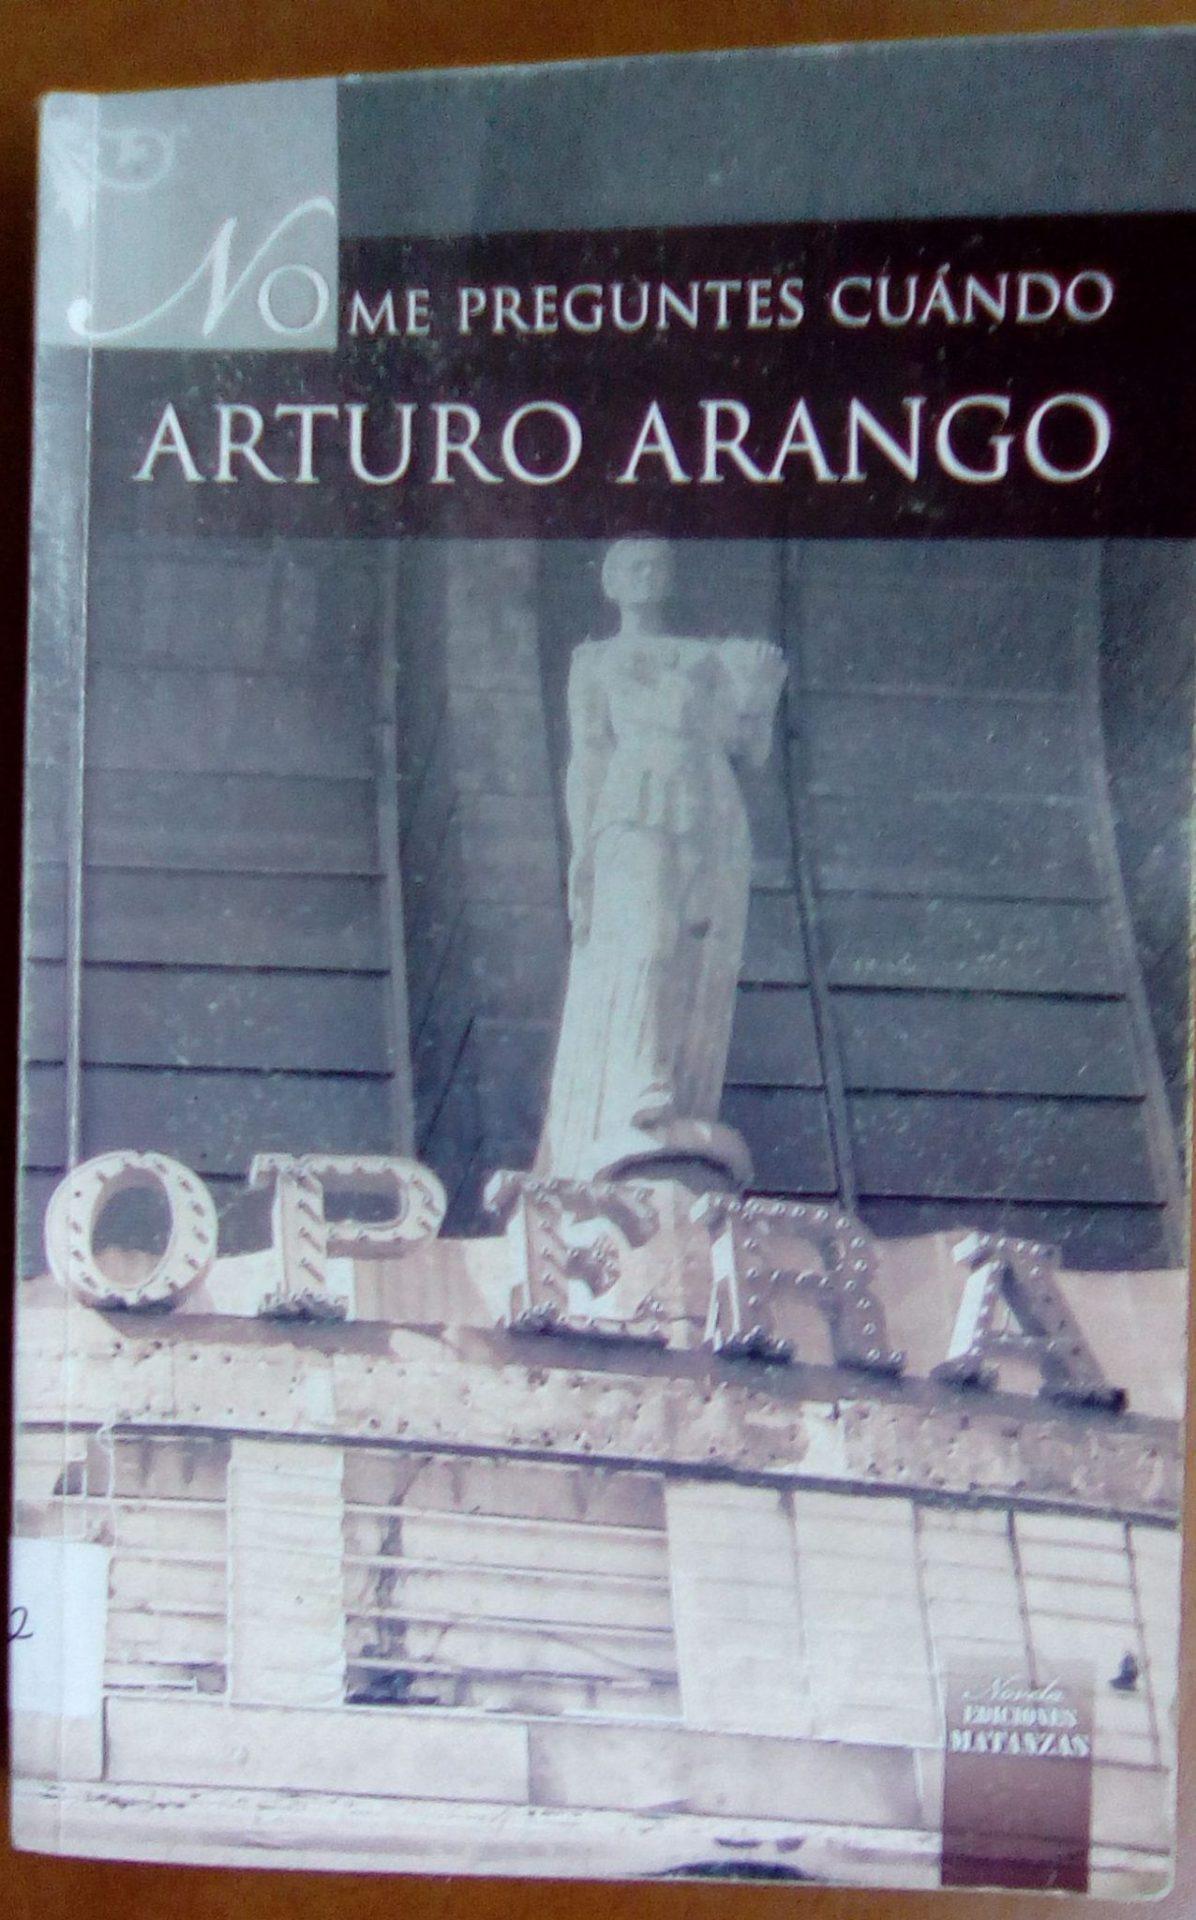 Novela-No-me-preguntes-cuando,-de-Arturo-Arango